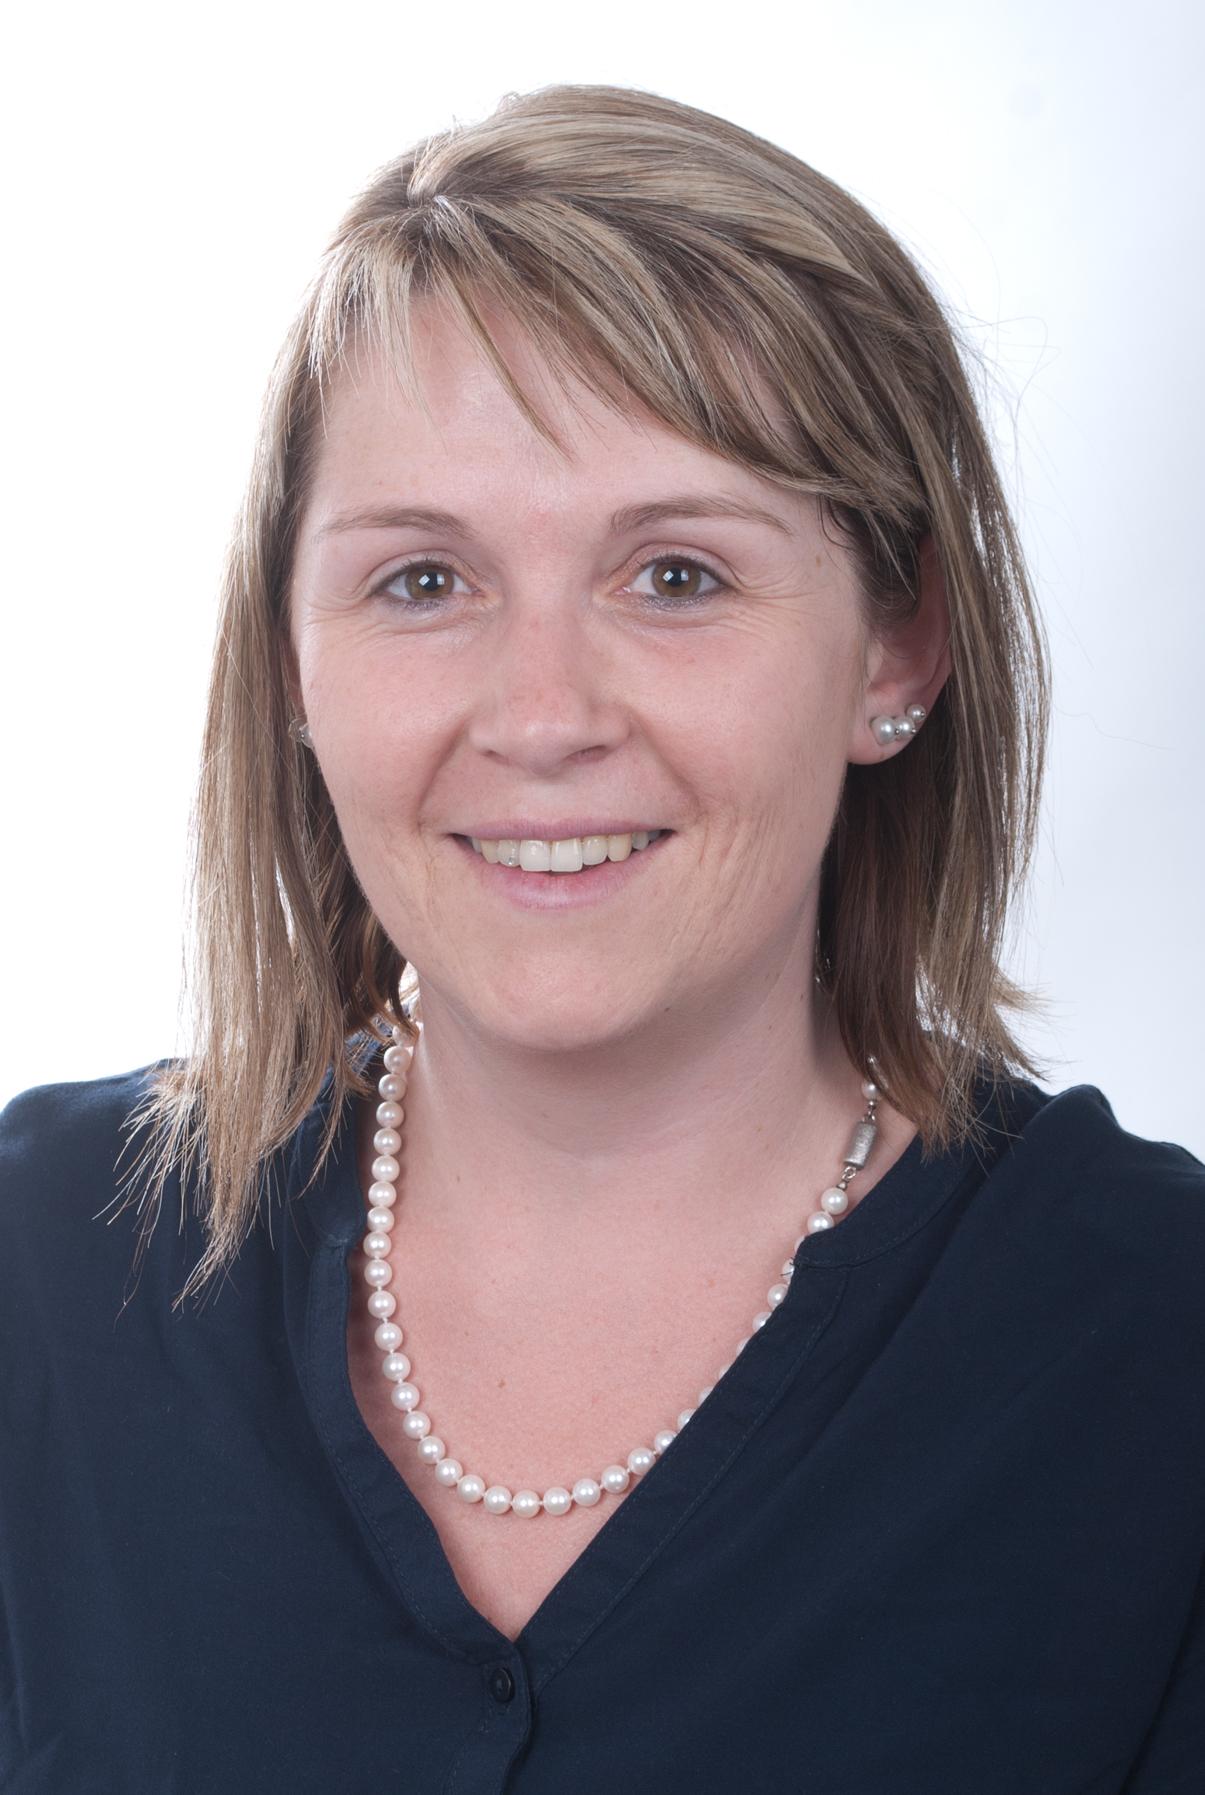 Anita Bachl